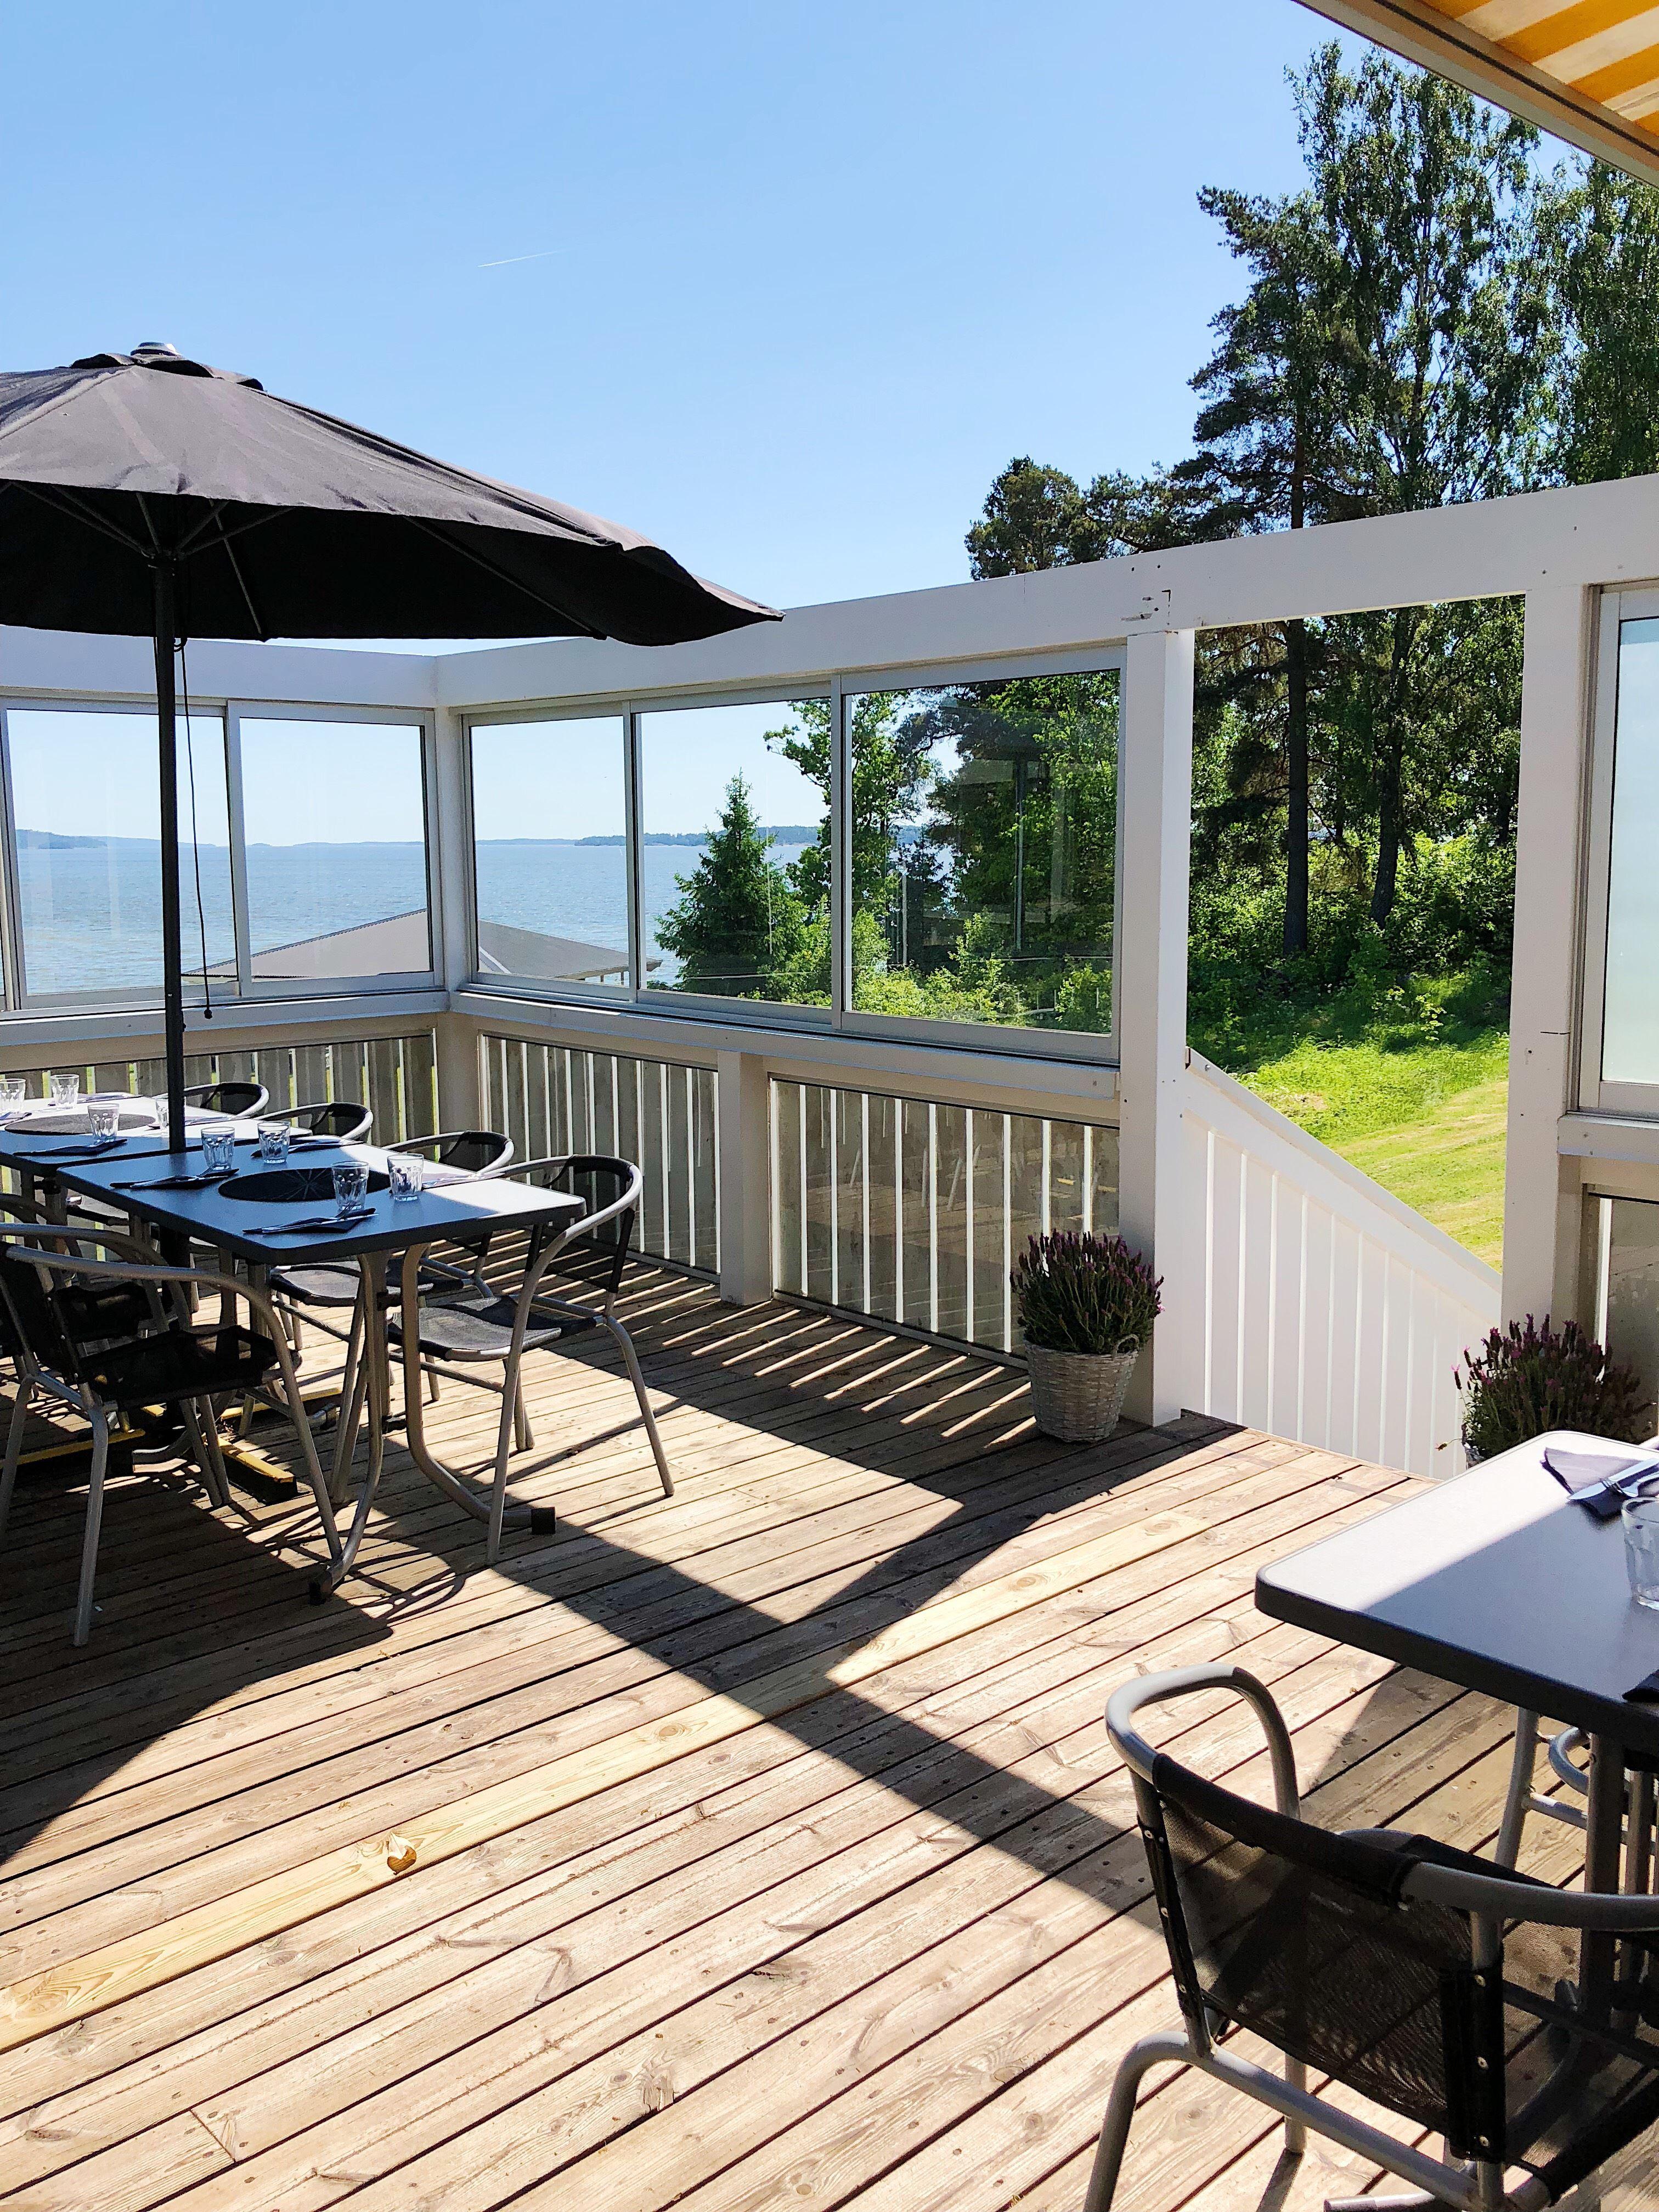 Fredgagården Hotel & Restaurant